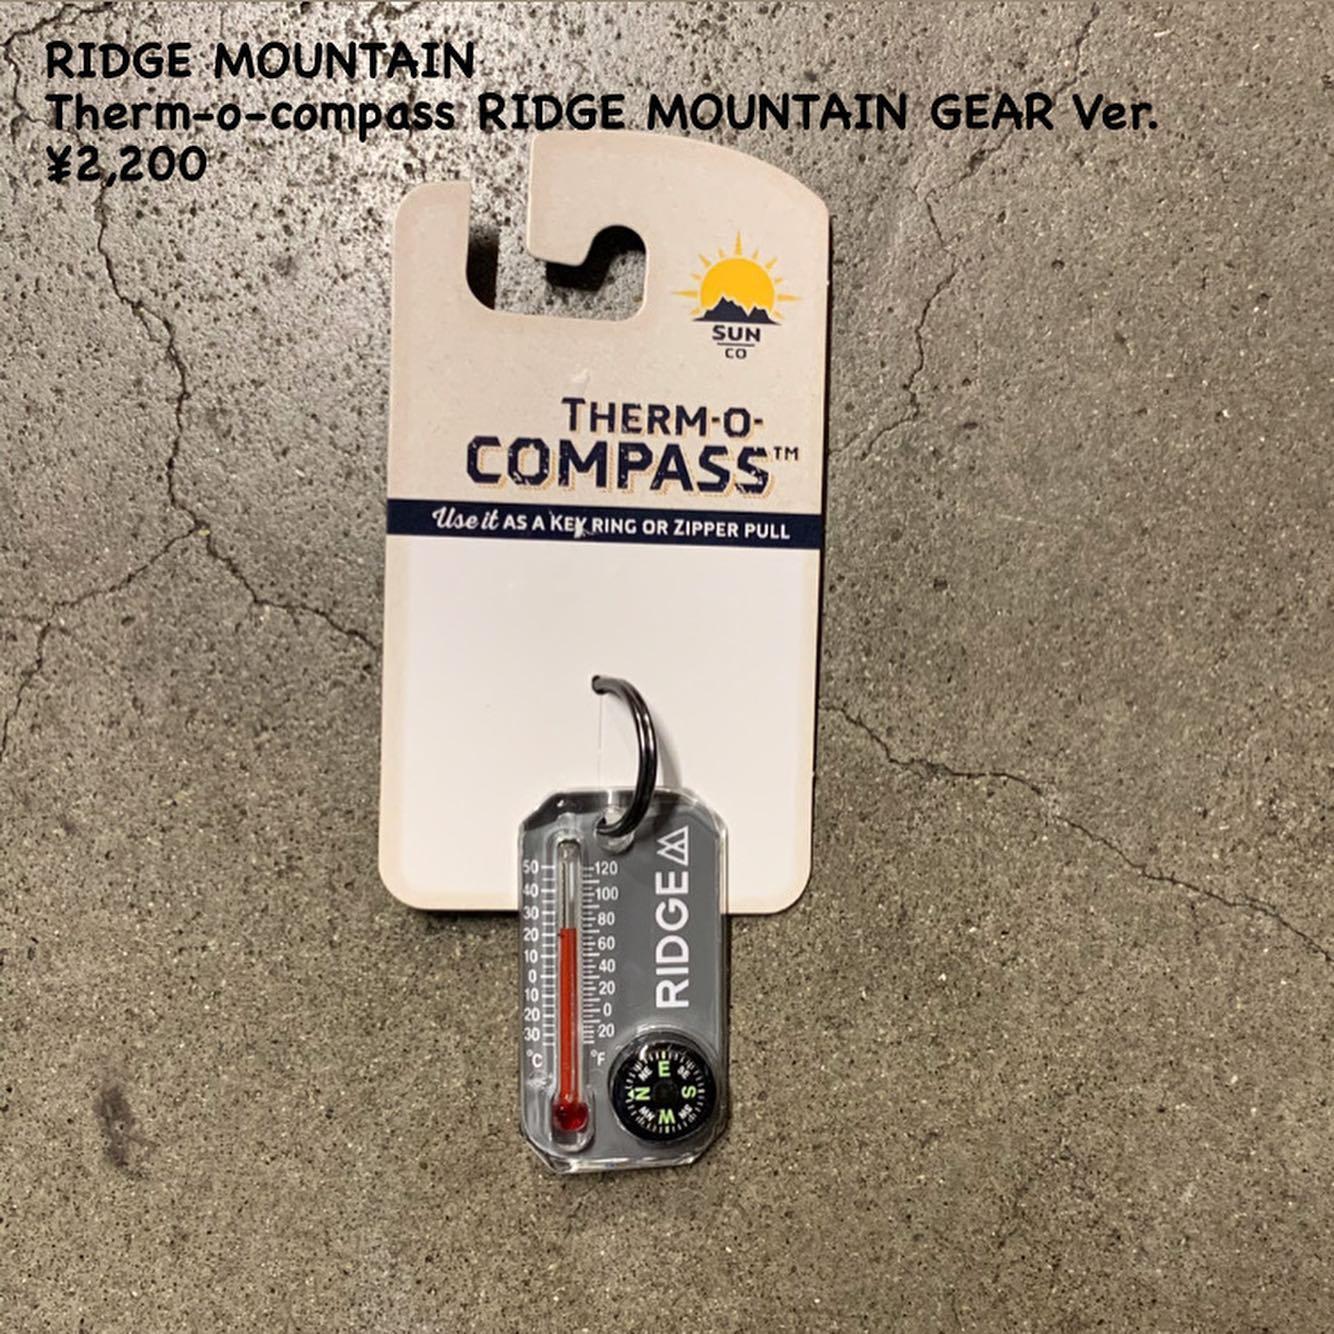 RIDGE MOUNTAIN  GEAR 別注のサンカンパニー製のサーモコンパスのご紹介